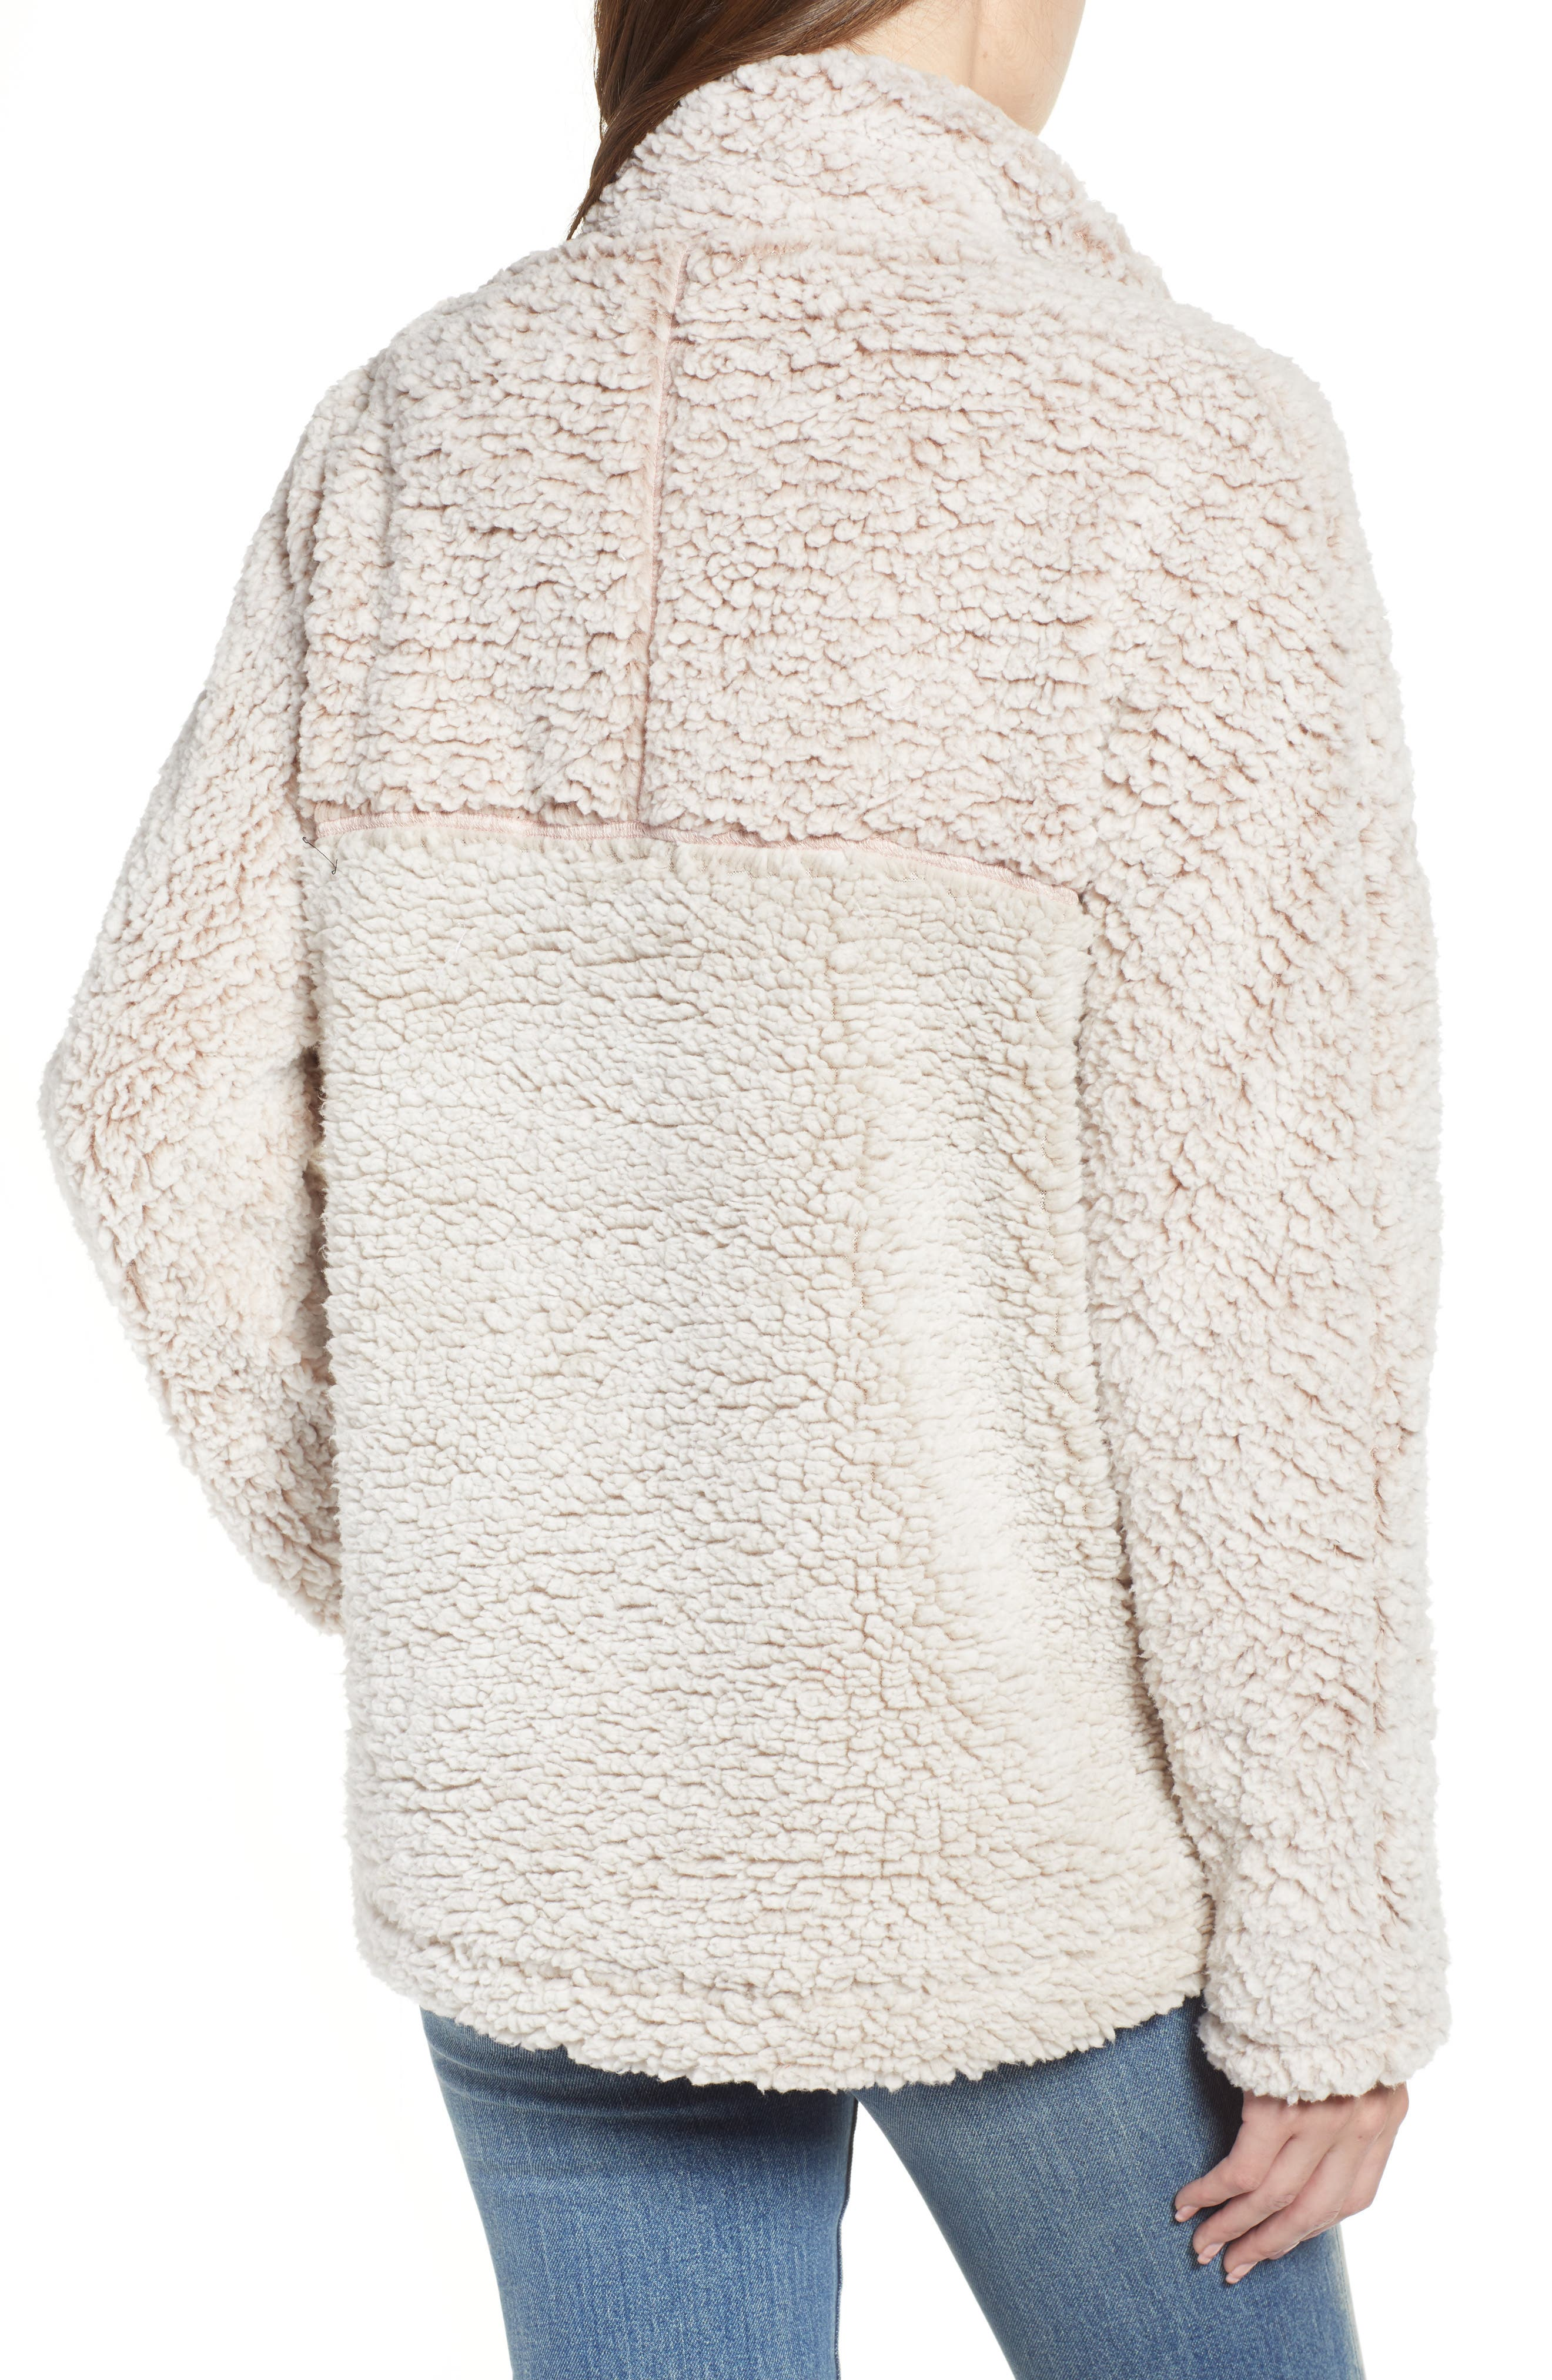 THREAD & SUPPLY, Colorblock Wubby Fleece Pullover, Alternate thumbnail 2, color, SMOKE ROSE IVORY